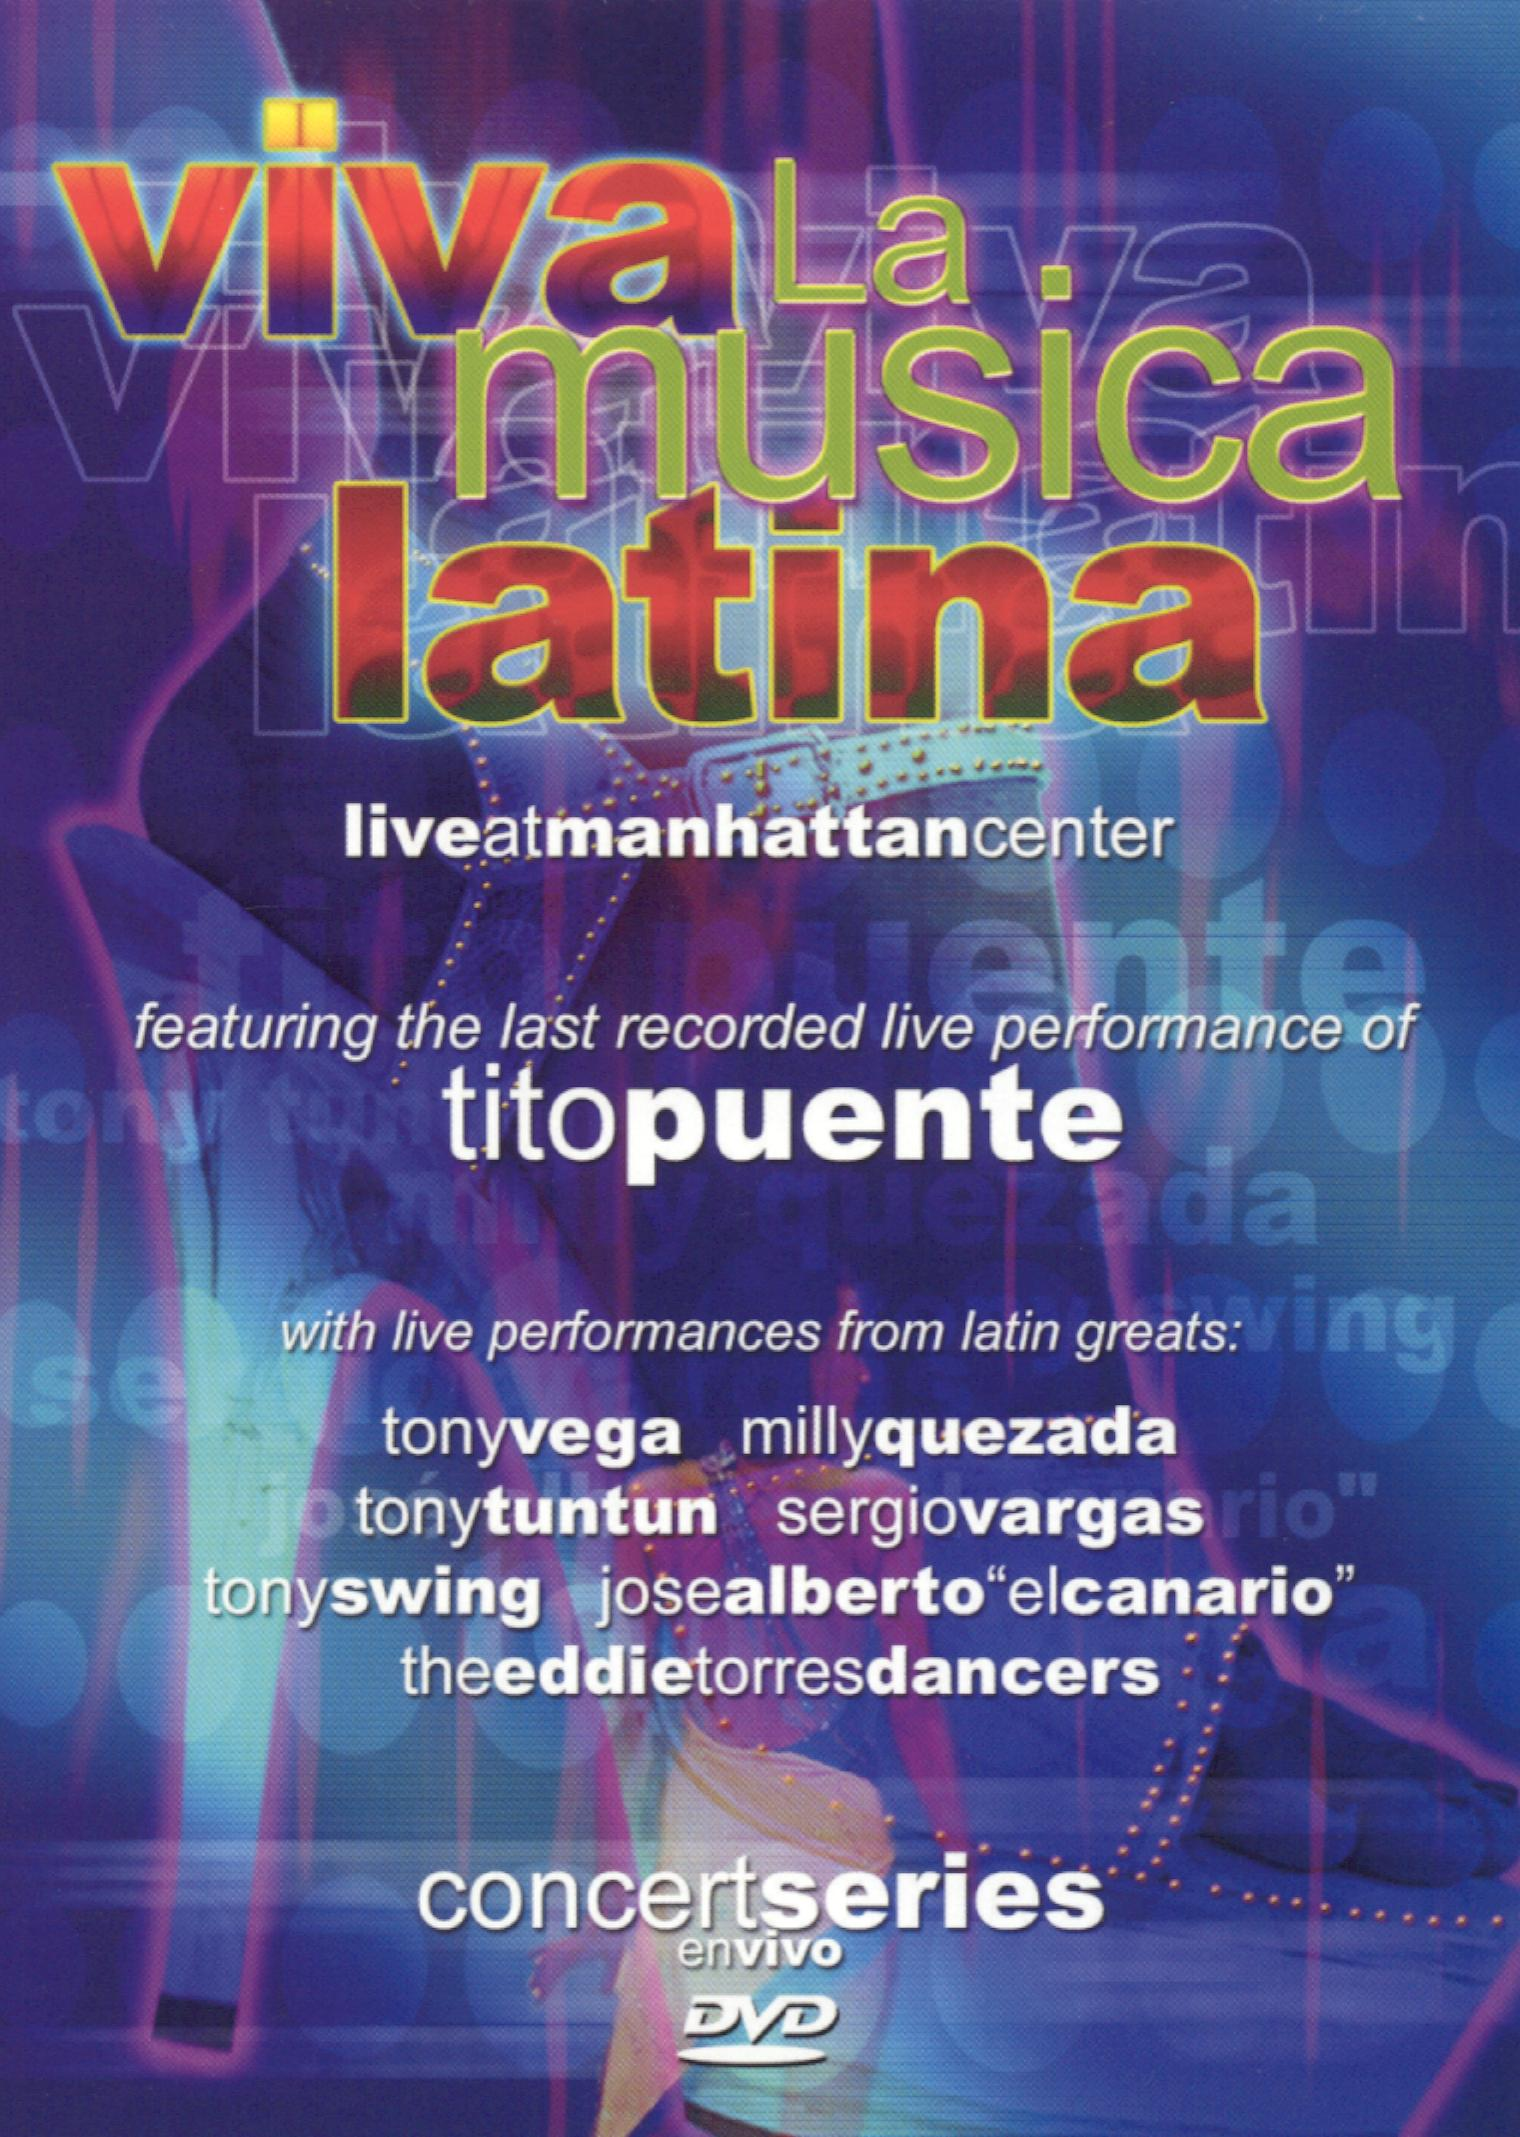 Viva la Musica Latina: Live at Manhattan Center